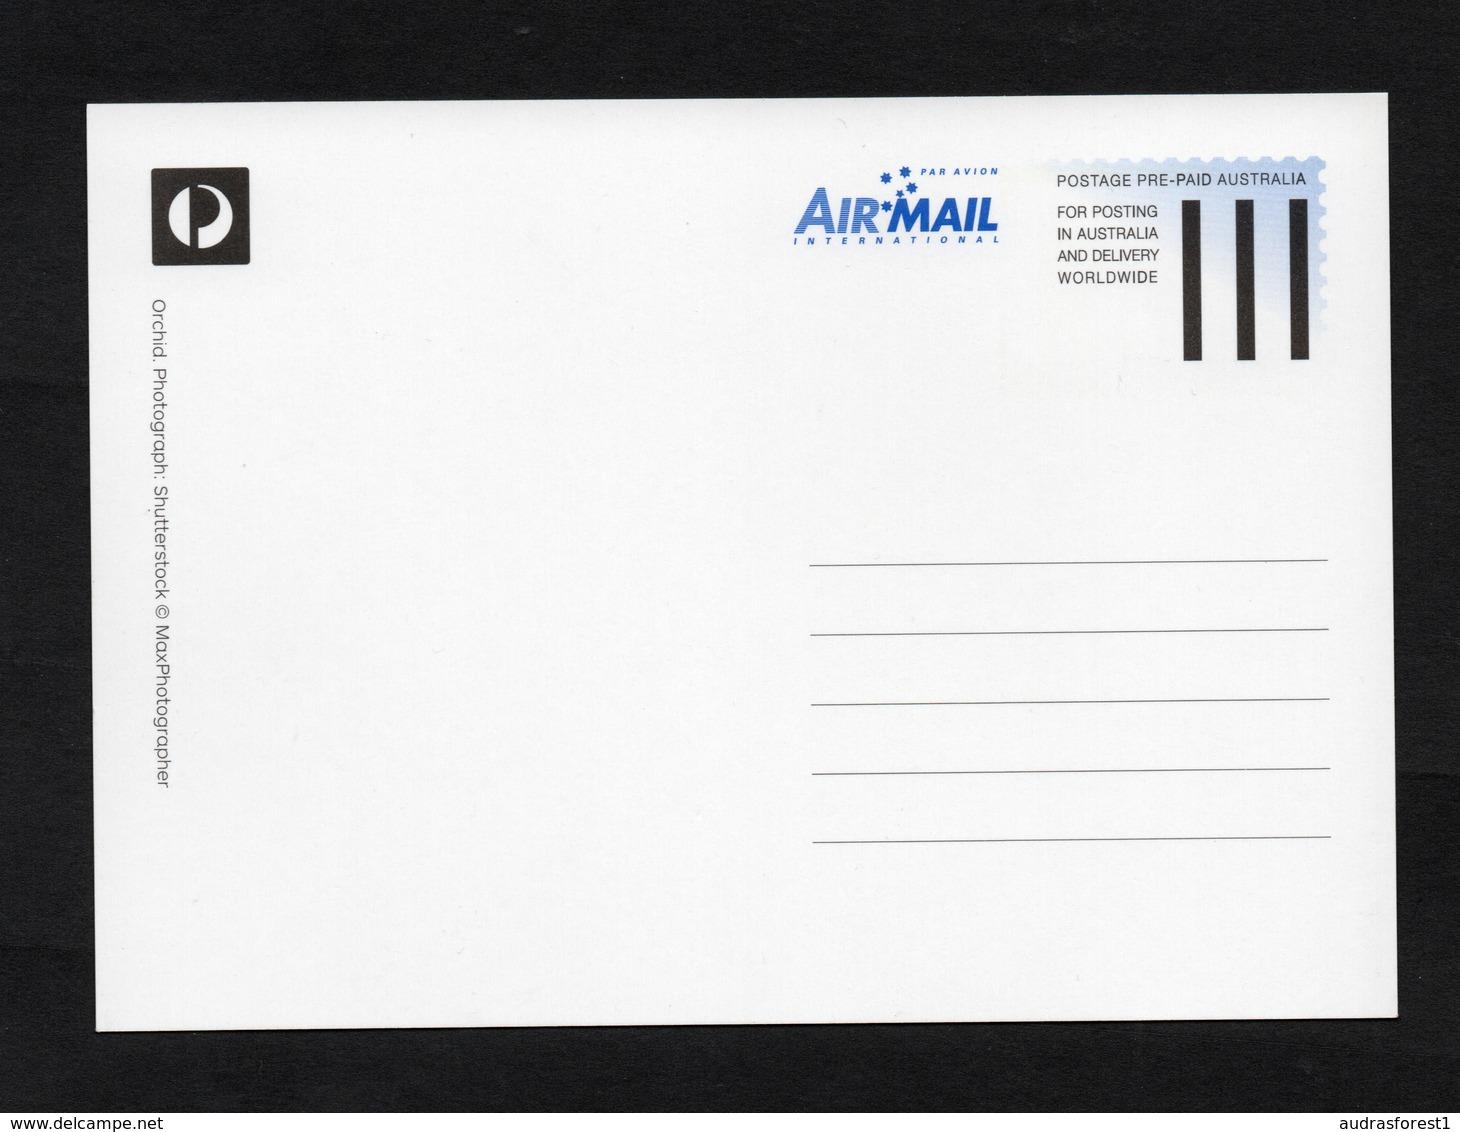 2013 ORCHID POSTAGE PRE-PAID AUSTRALIA WORLDWIDE AIRMAIL MAXIMUM CARD 60c FIRST DAY ISSUE CANCEL 05/02/2013 - Maximumkarten (MC)